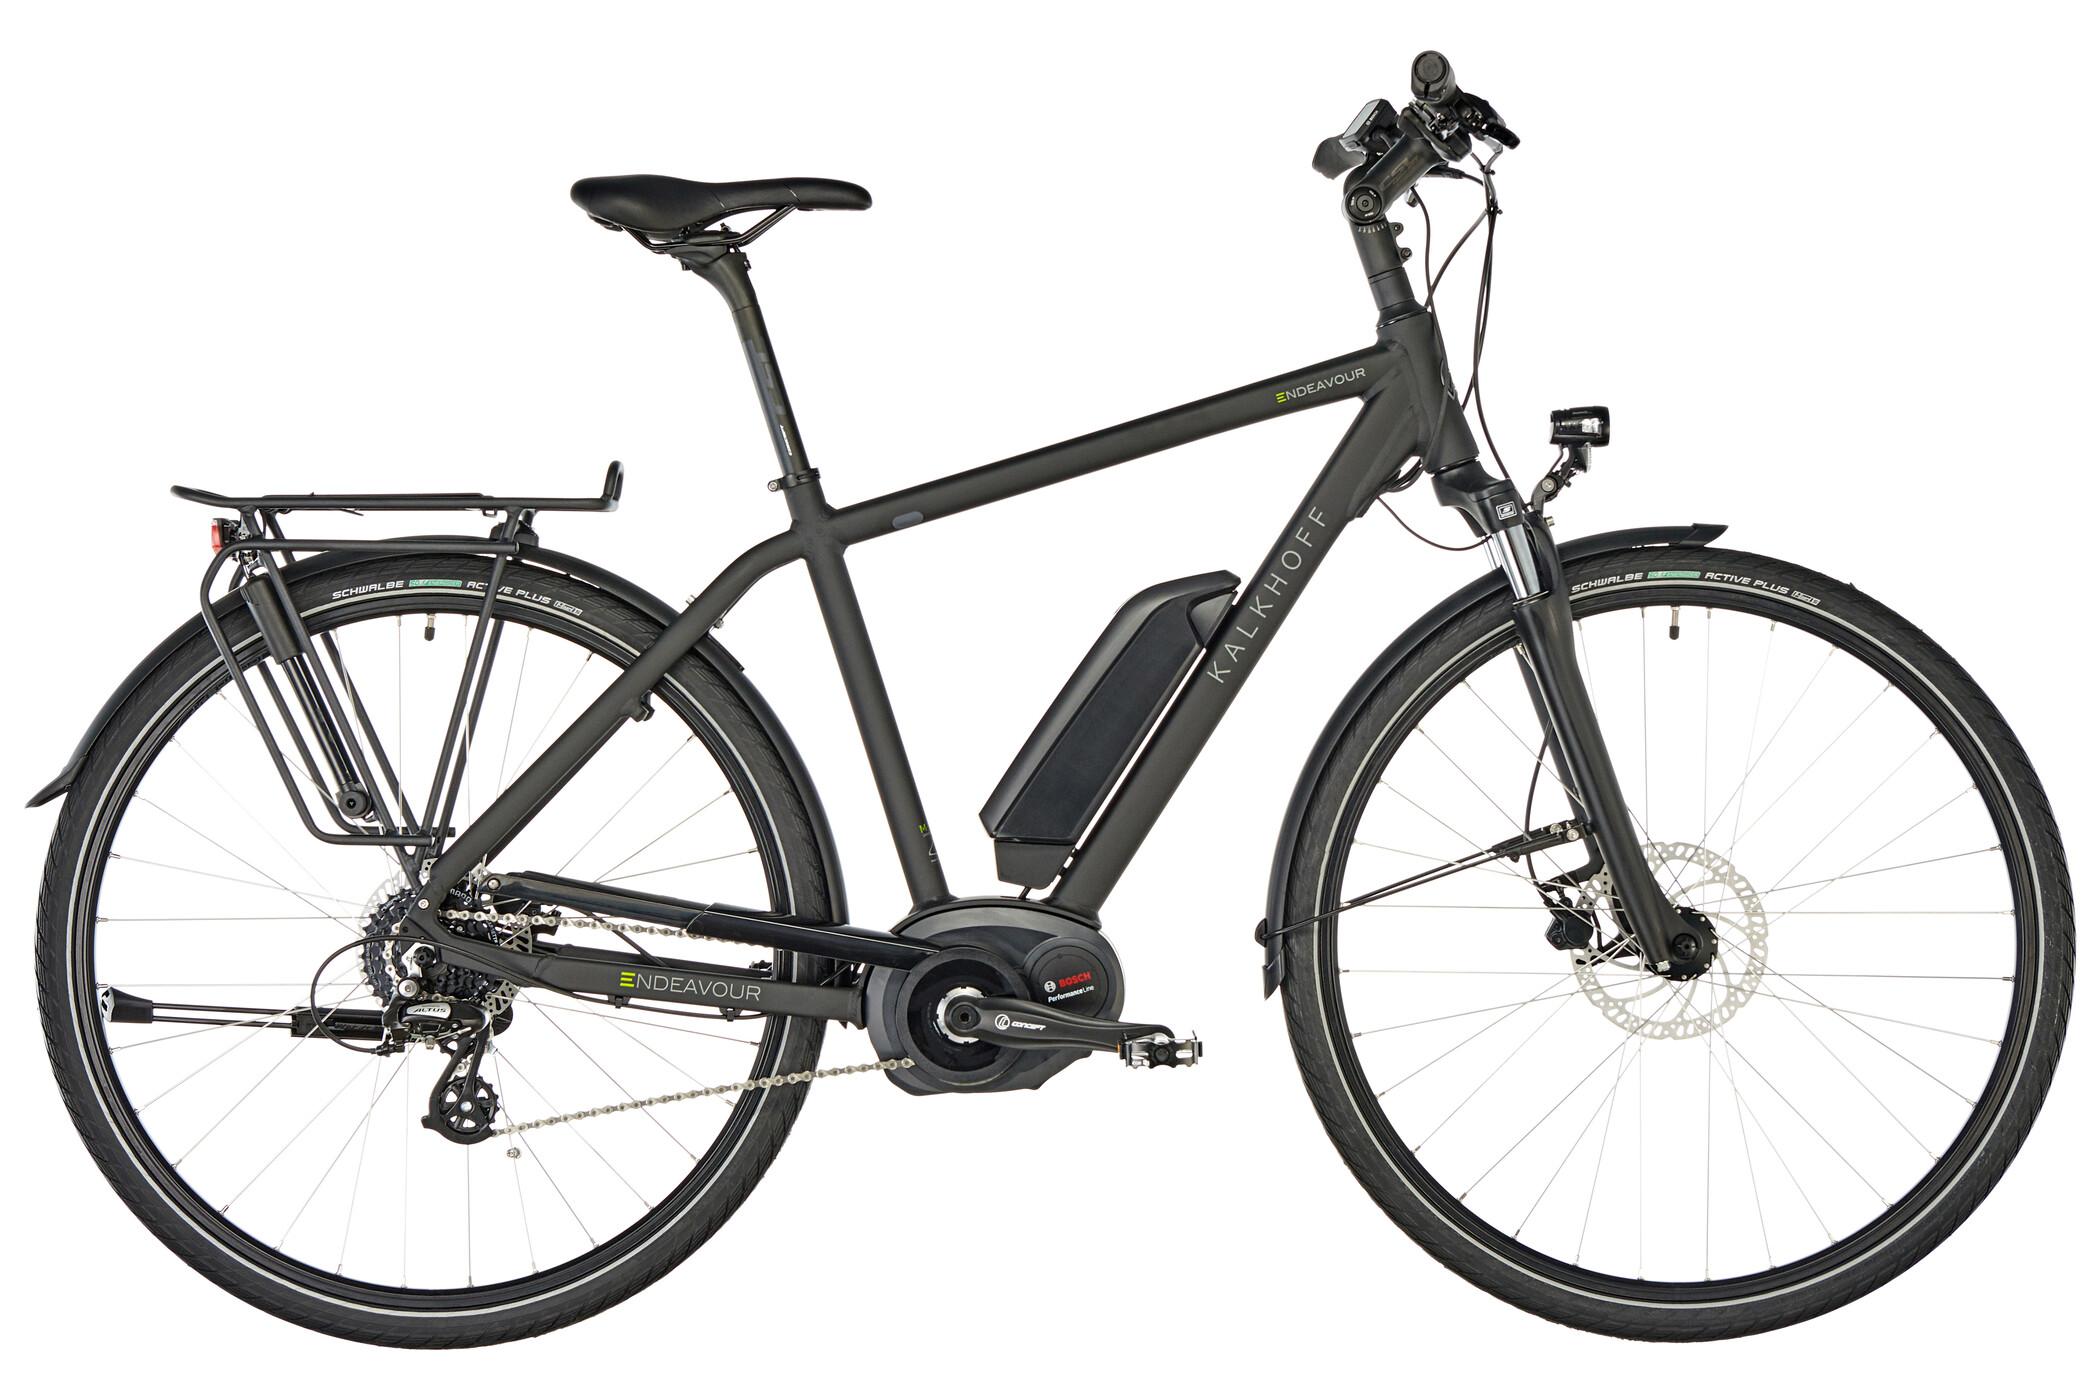 Kalkhoff Endeavour 1.B Move E-trekkingcykel Diamant 400Wh sort (2019) | City-cykler